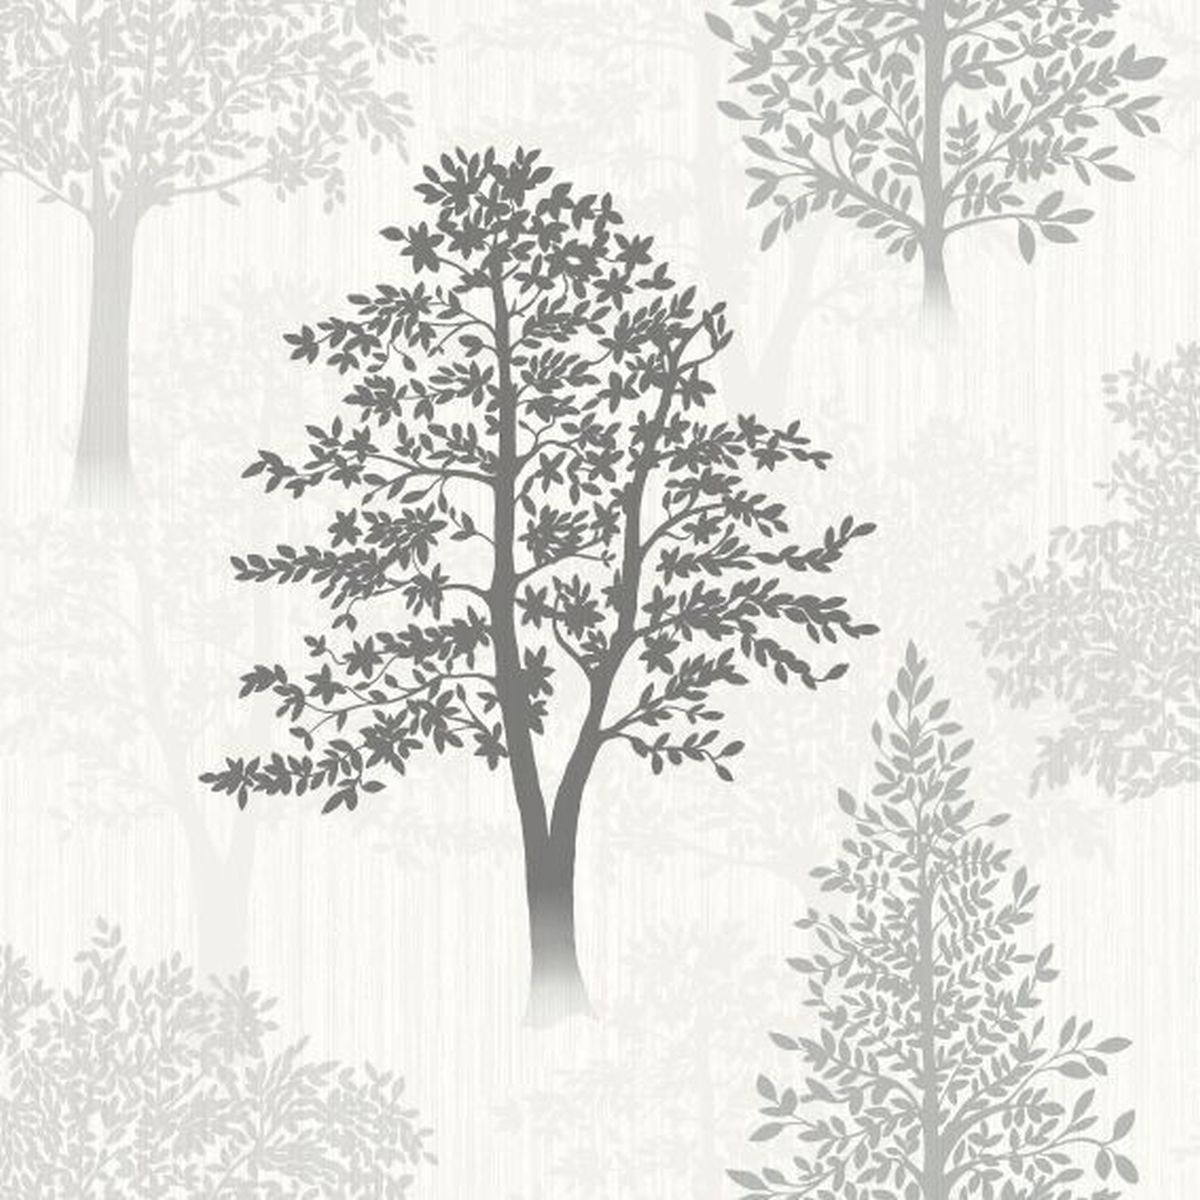 Best of Arthouse Vliestapete ansprechende Tapete 259001 Grau Blumentapete